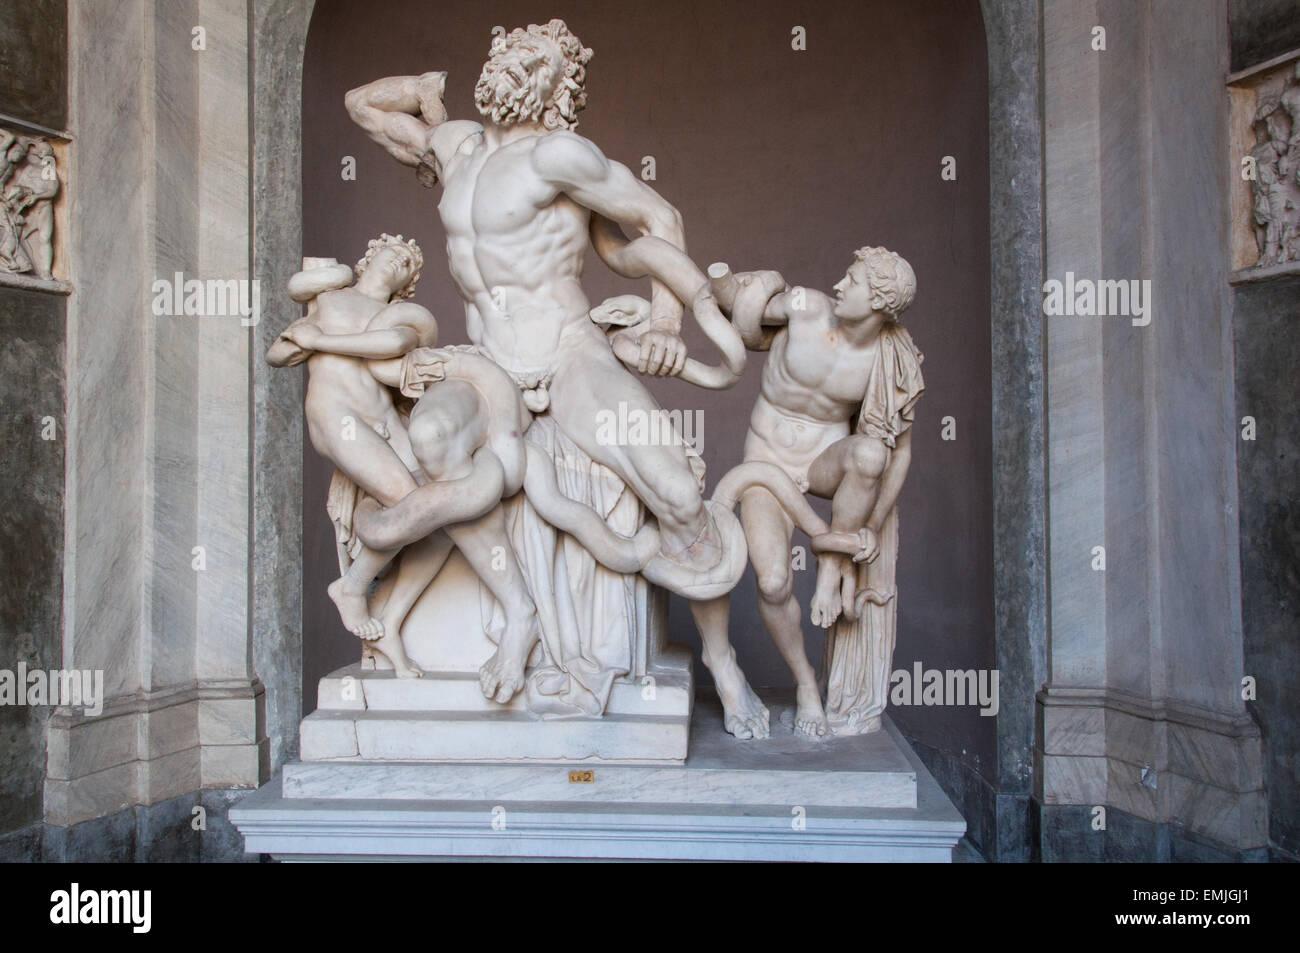 statue-of-the-greek-mythological-laocoonte-in-the-vatican-museums-EMJGJ1.jpg